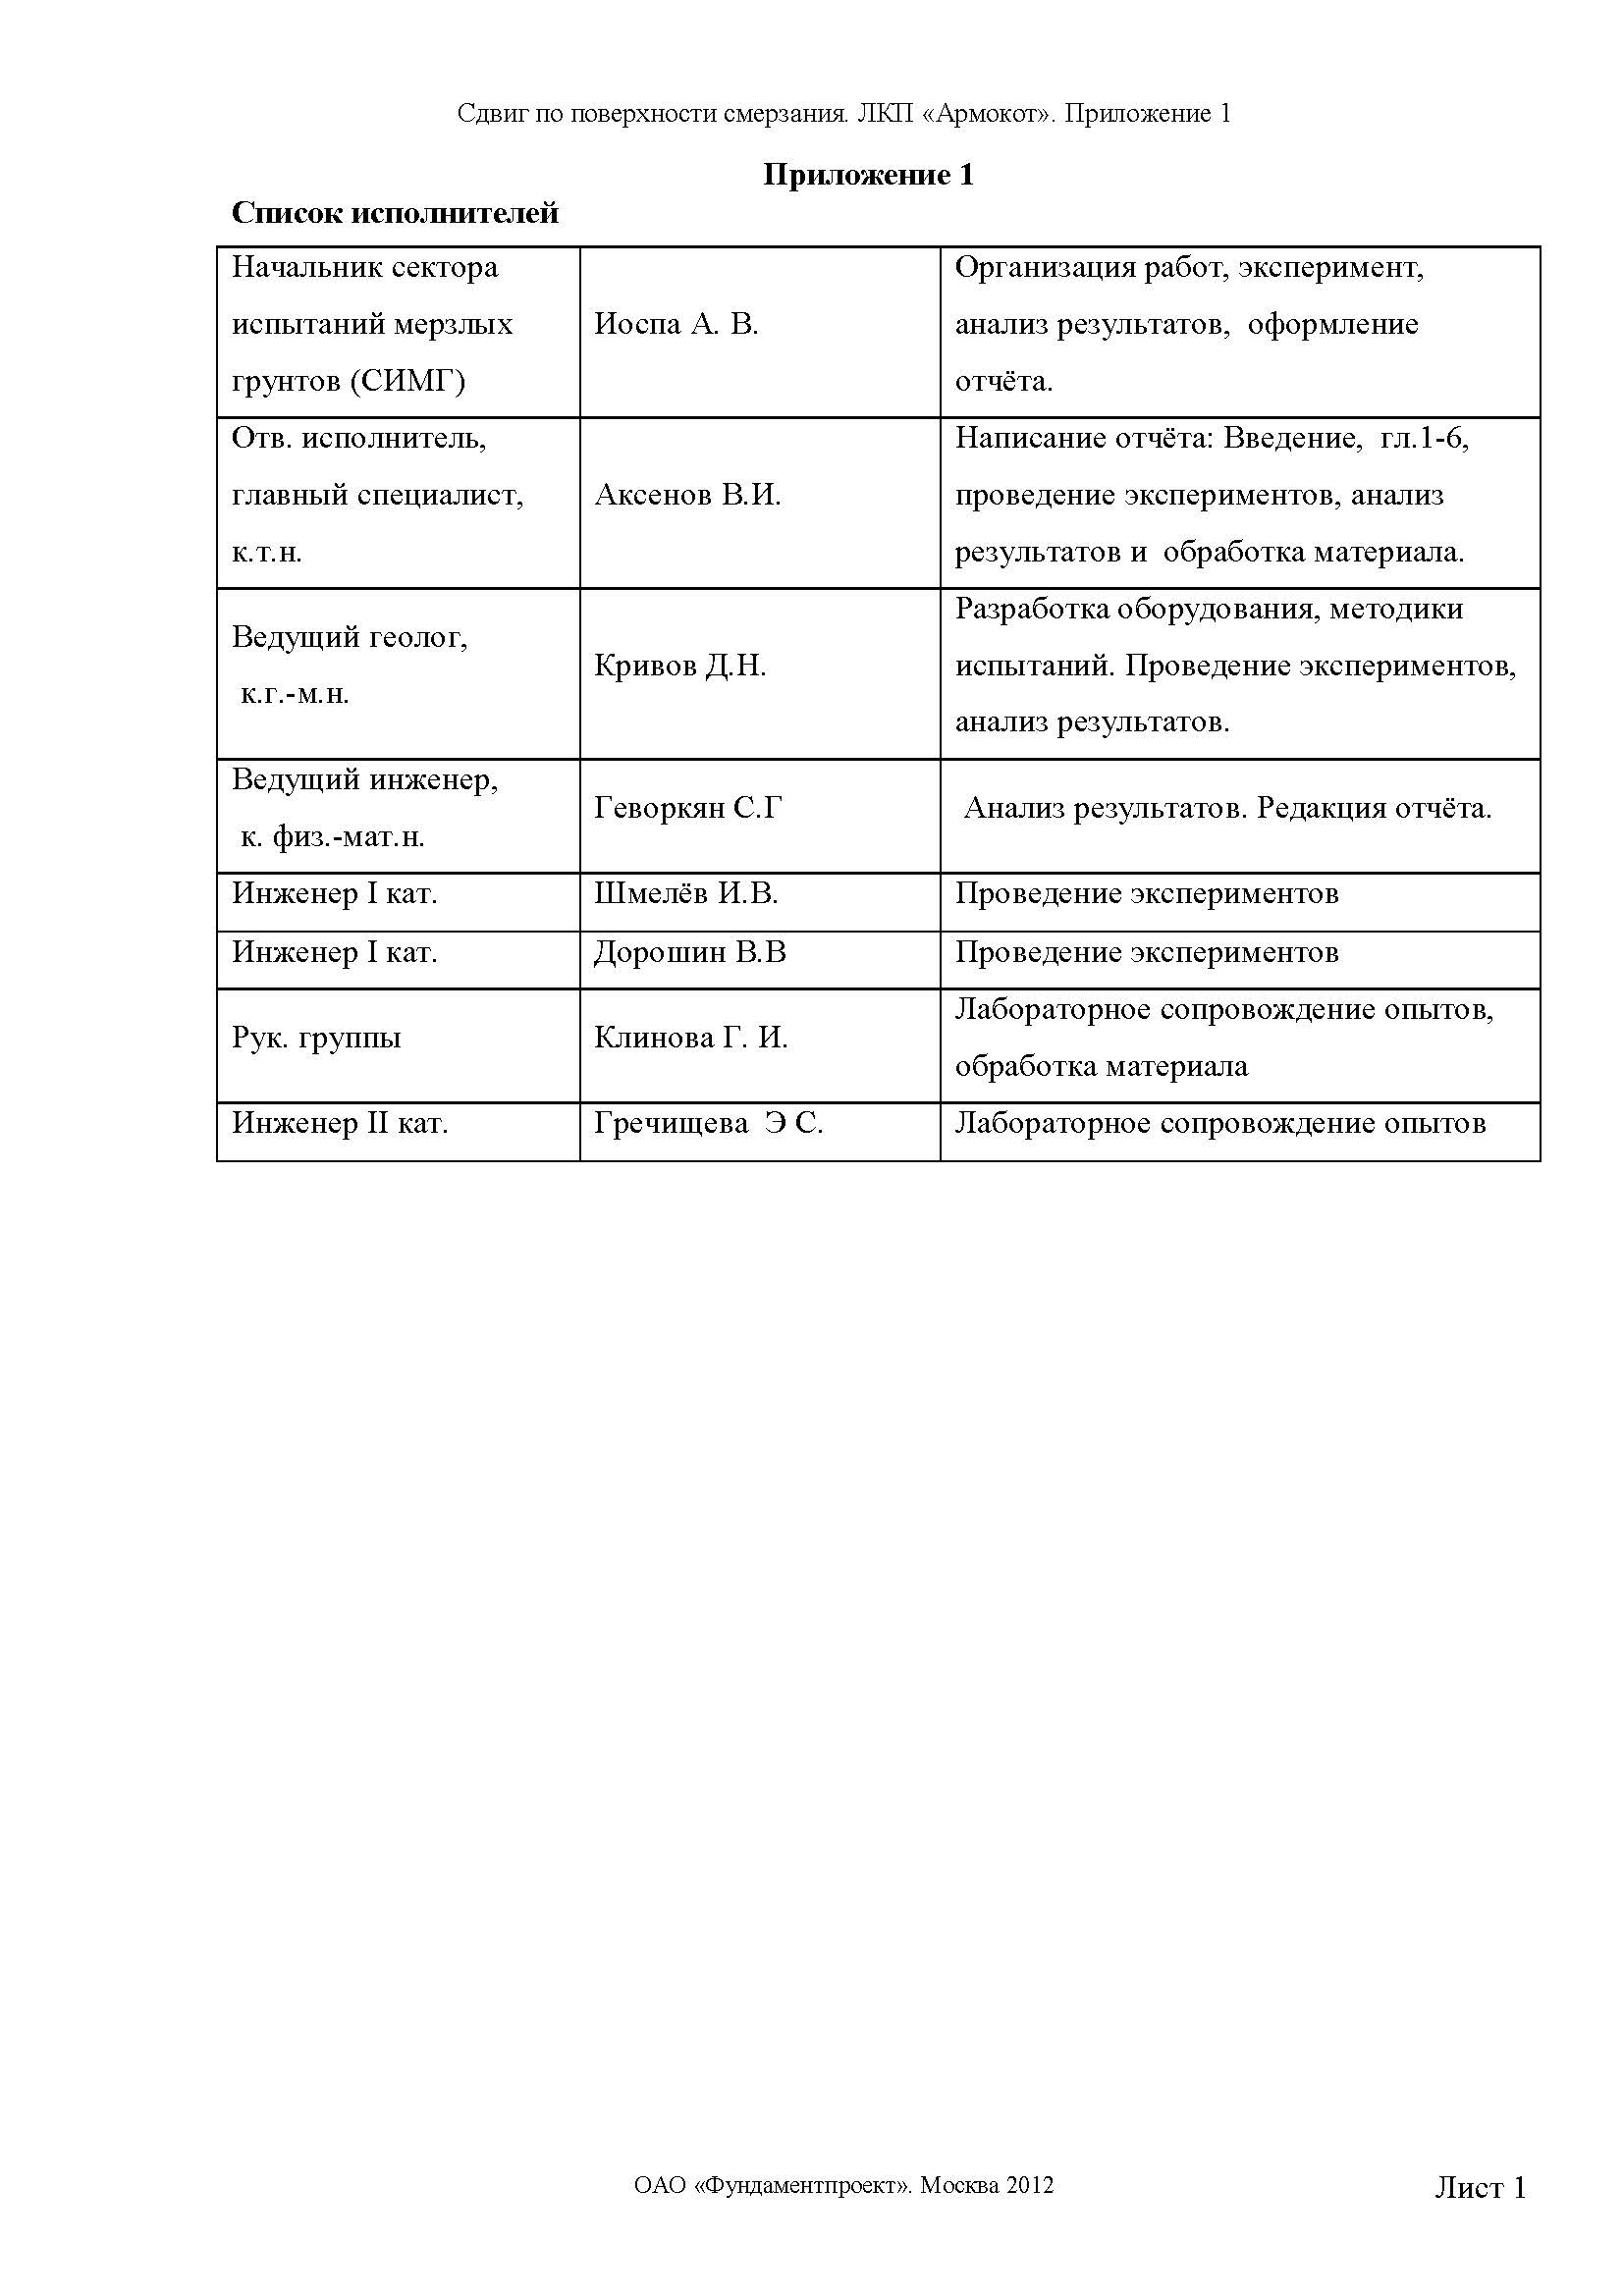 Отчет по сваям Армокот V500 Фундаментпроект_Страница_24